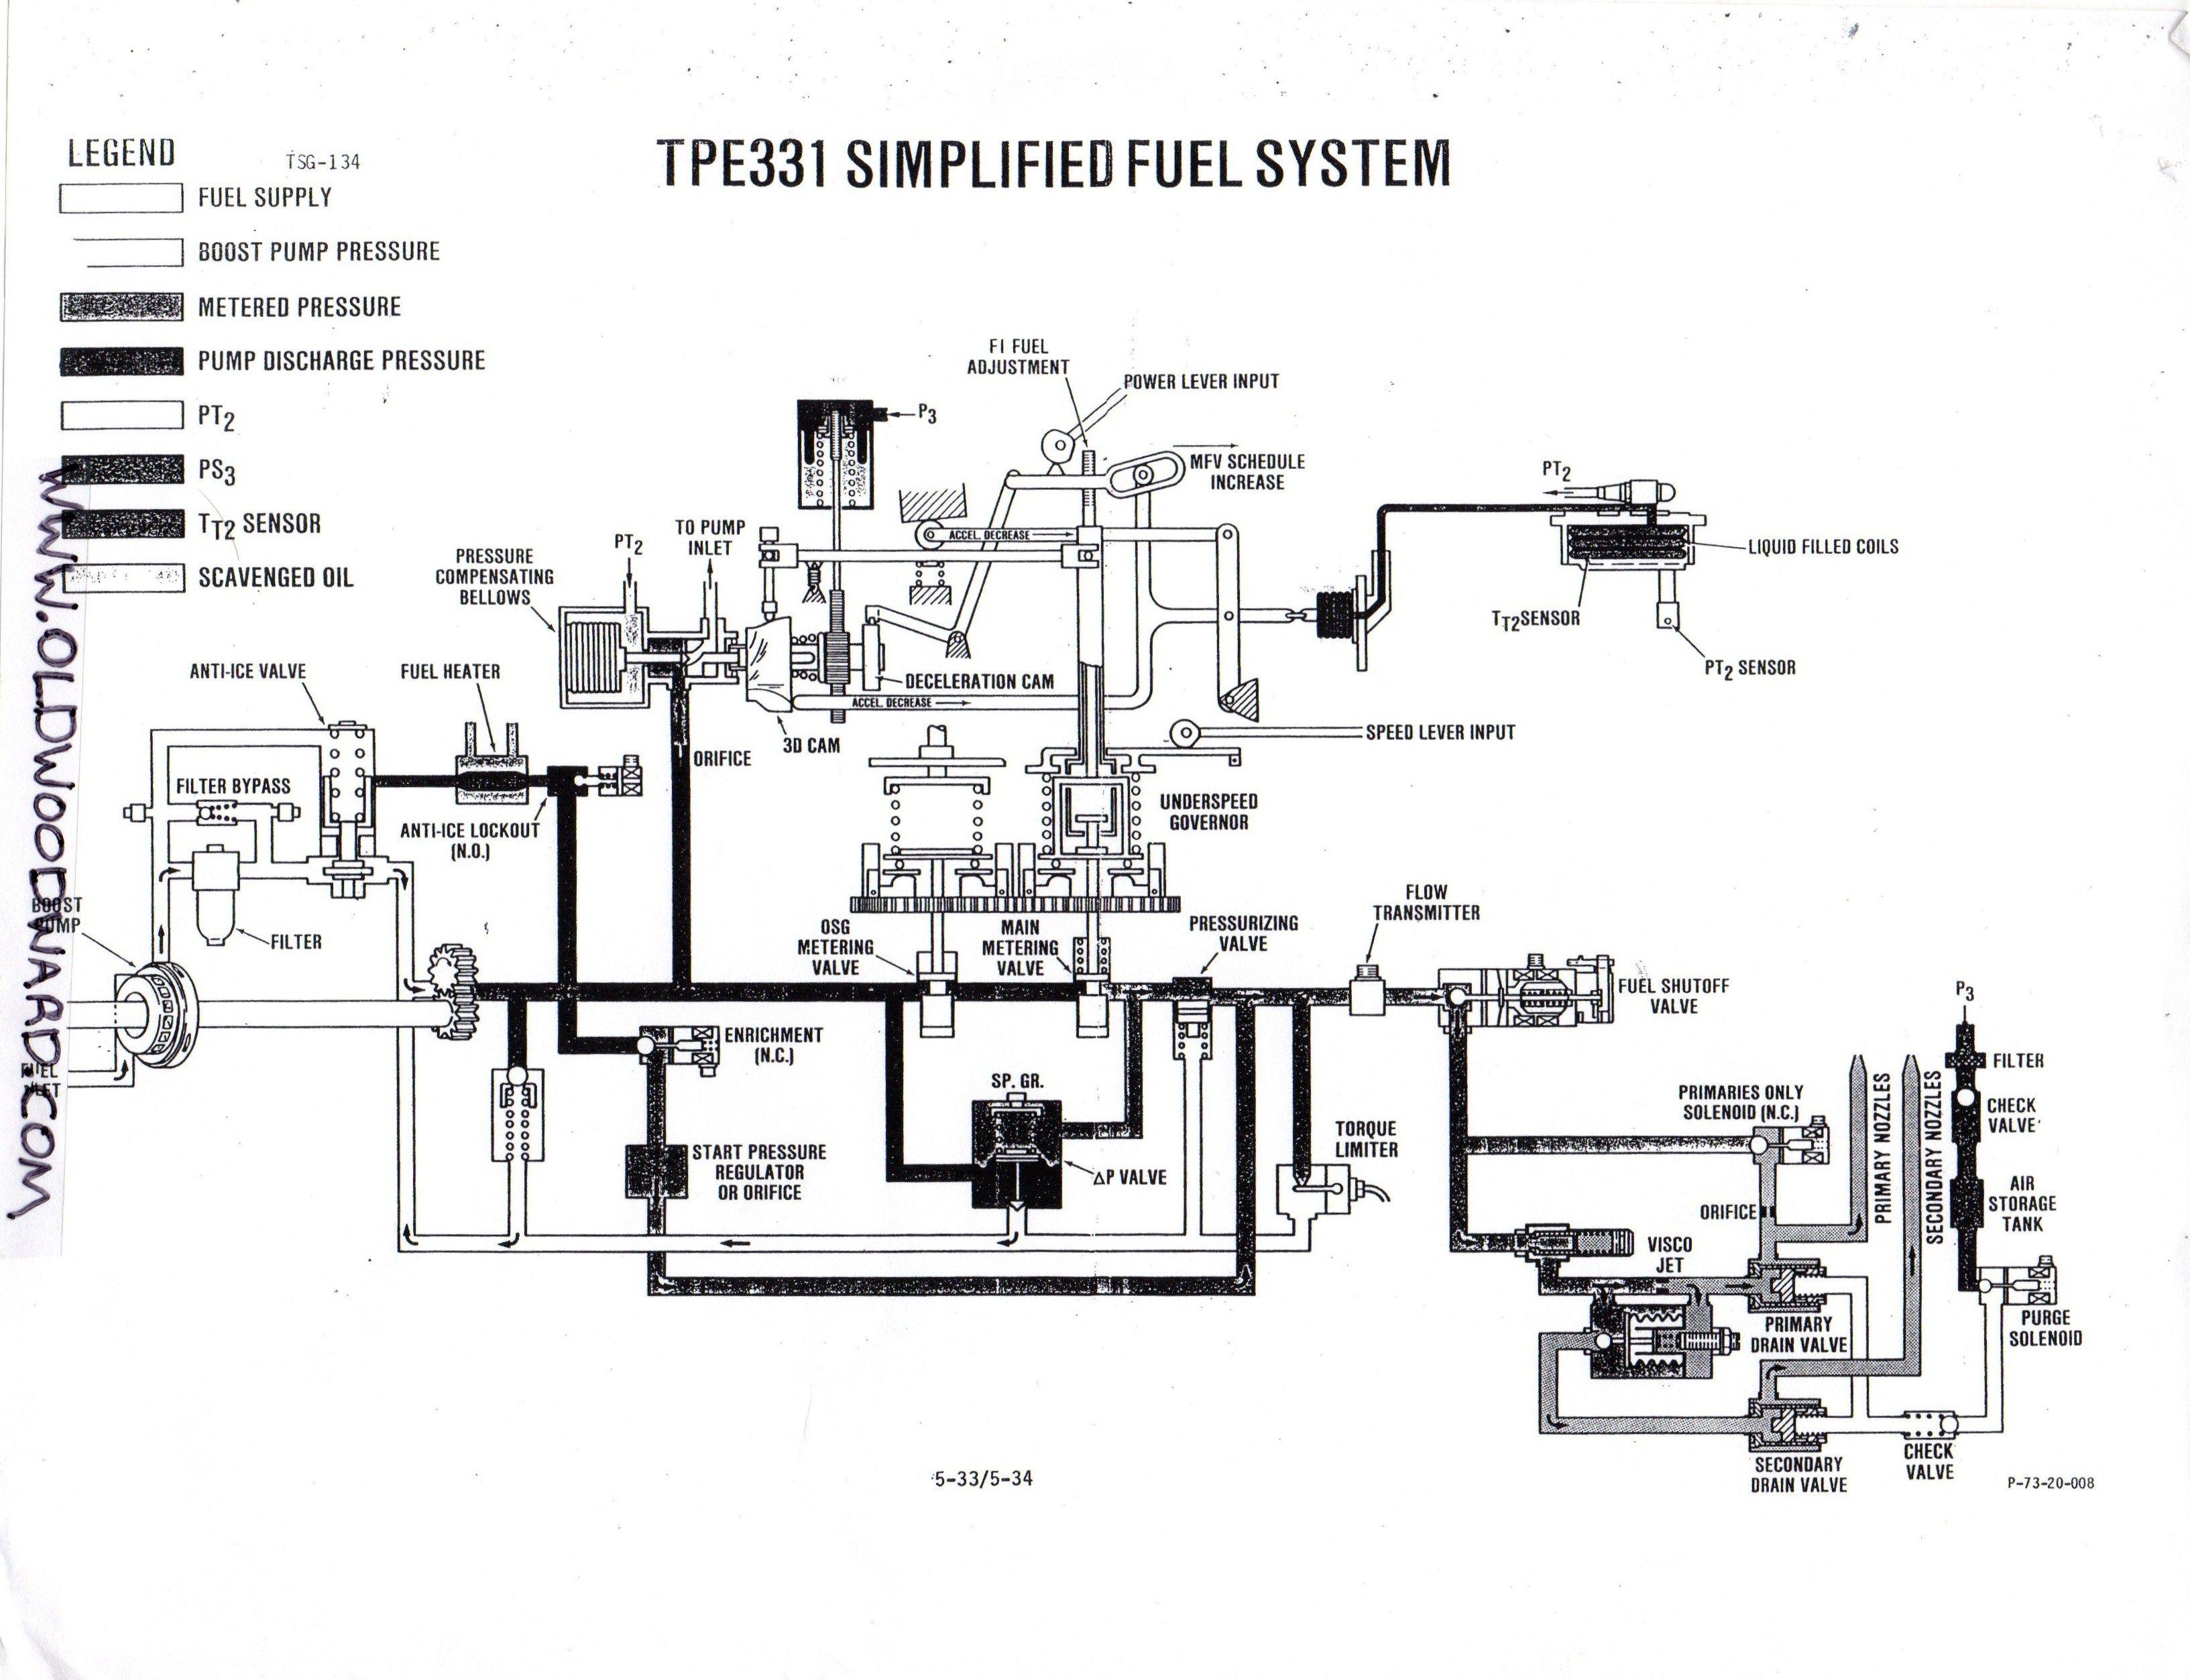 woodward tpe331 gas turbine main engine control training manual  [ 3266 x 2506 Pixel ]